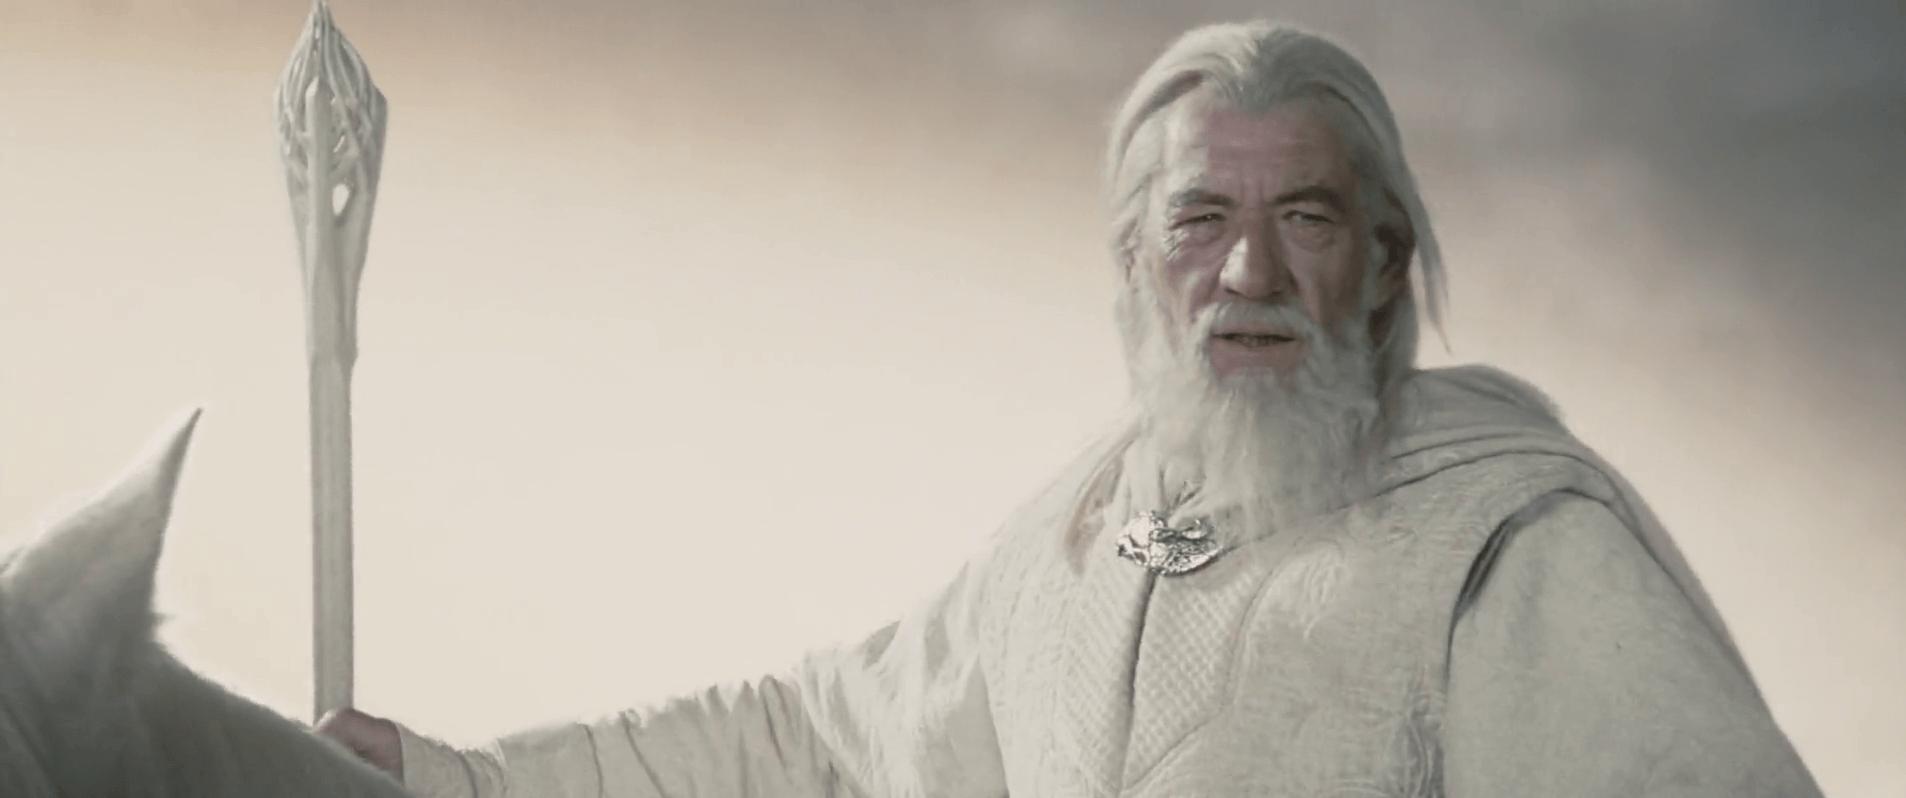 Gandalf The White